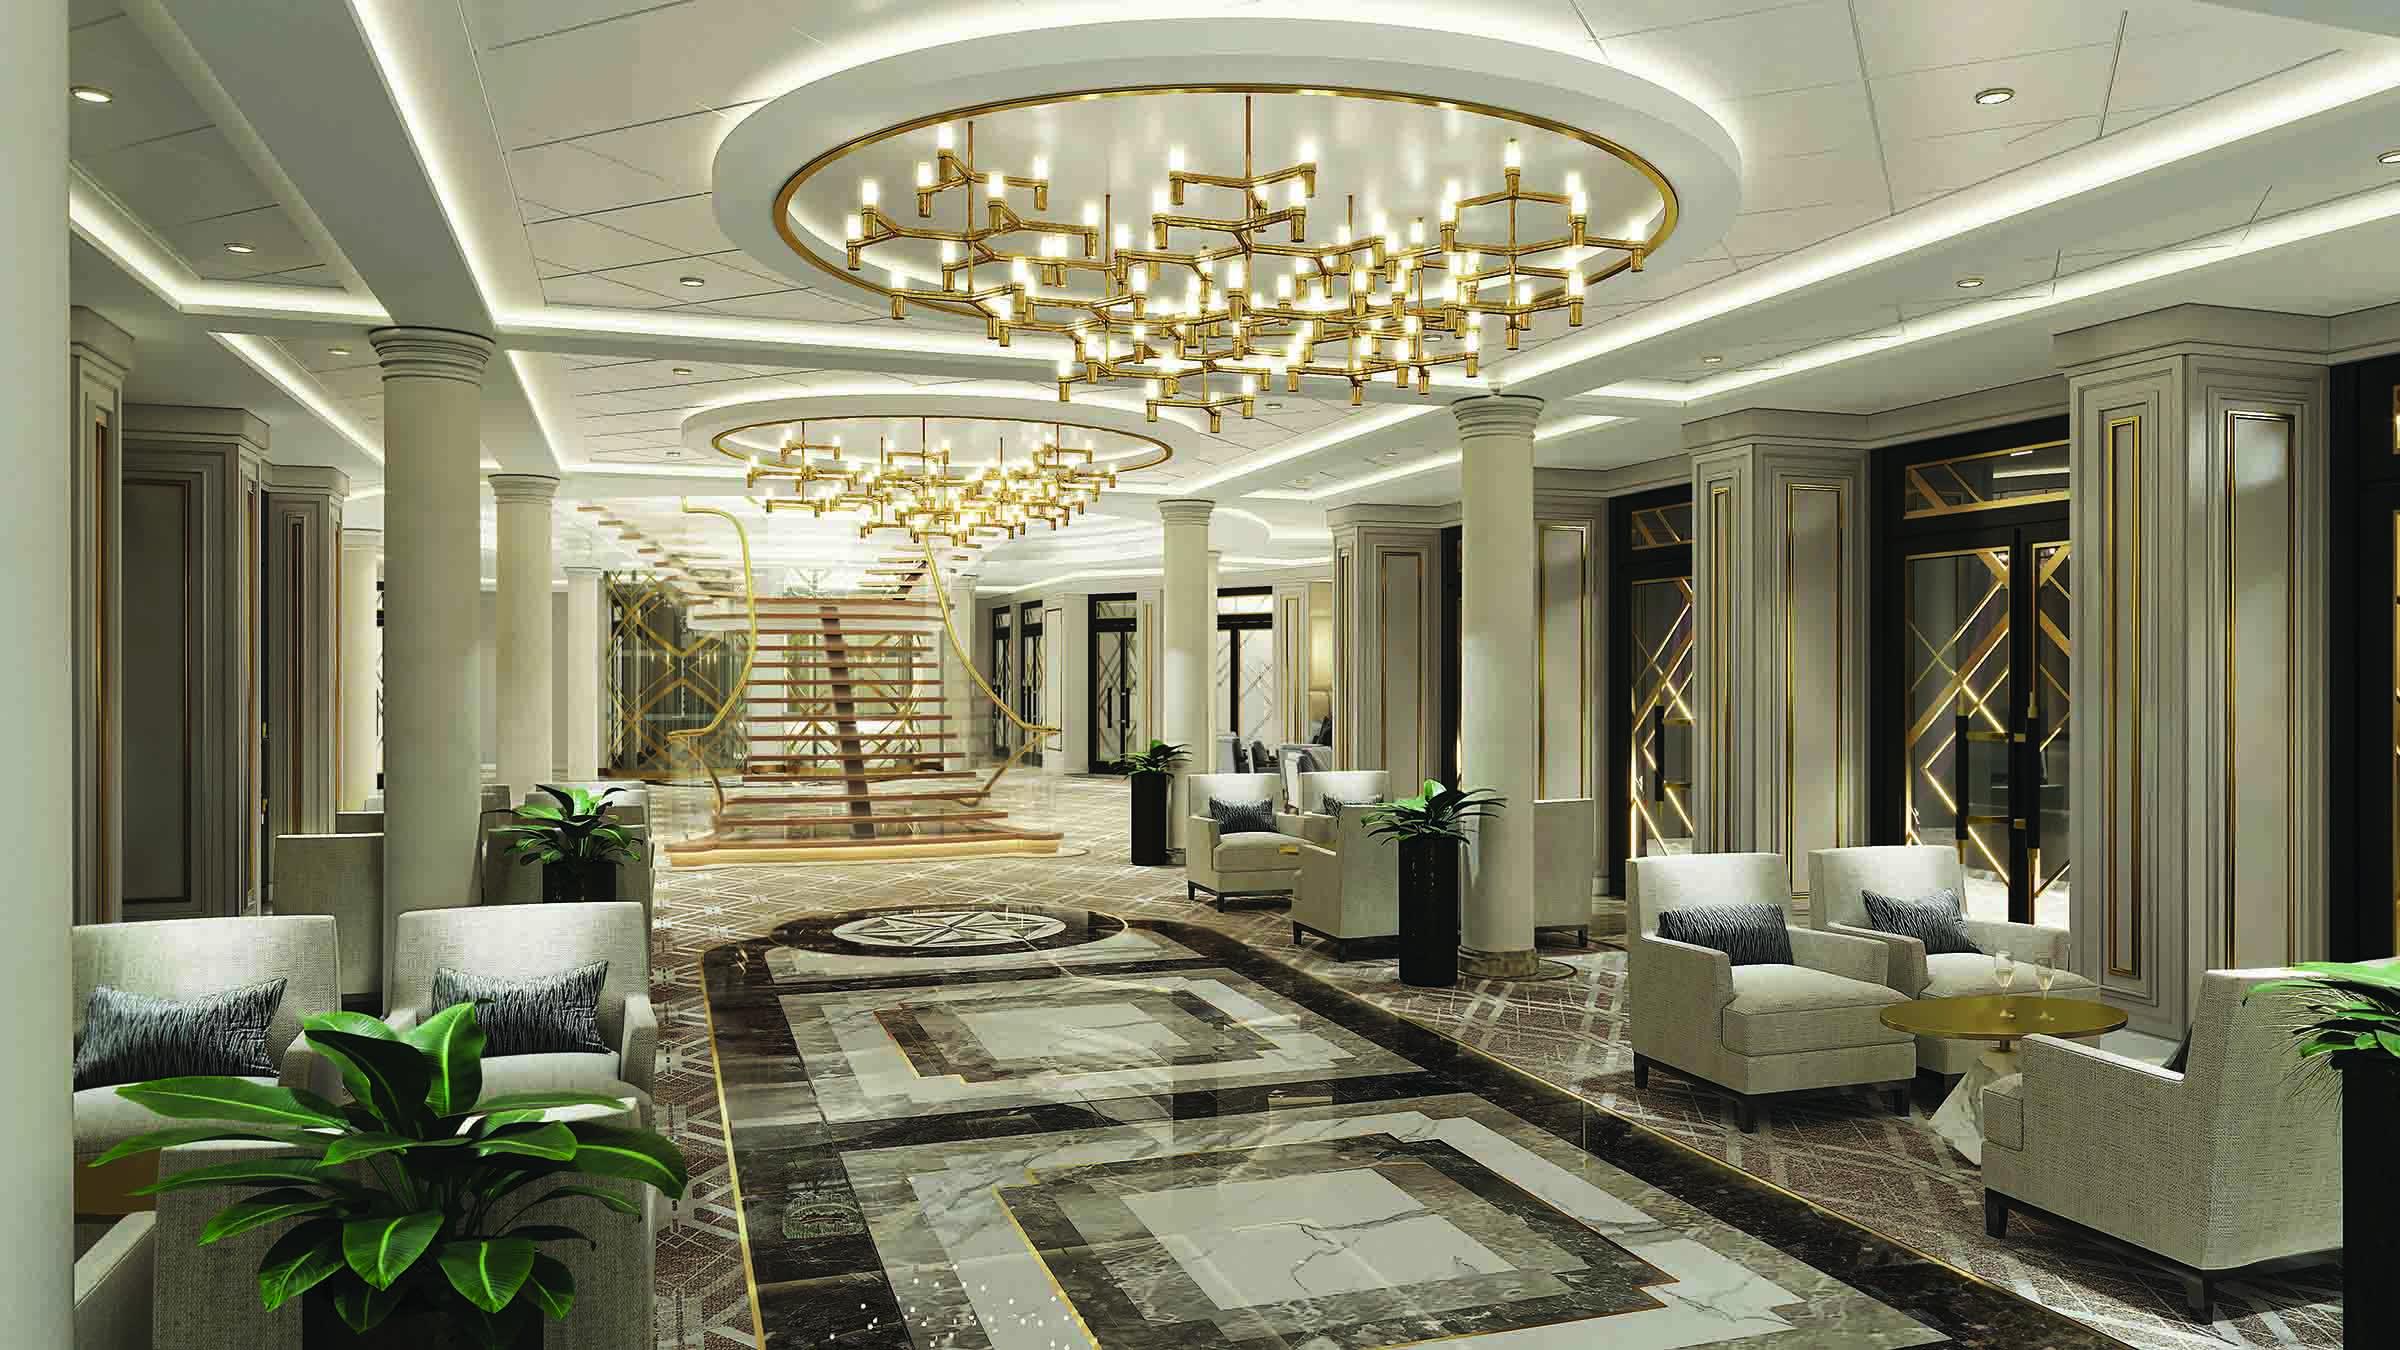 Seven Seas Splendor - Atrium